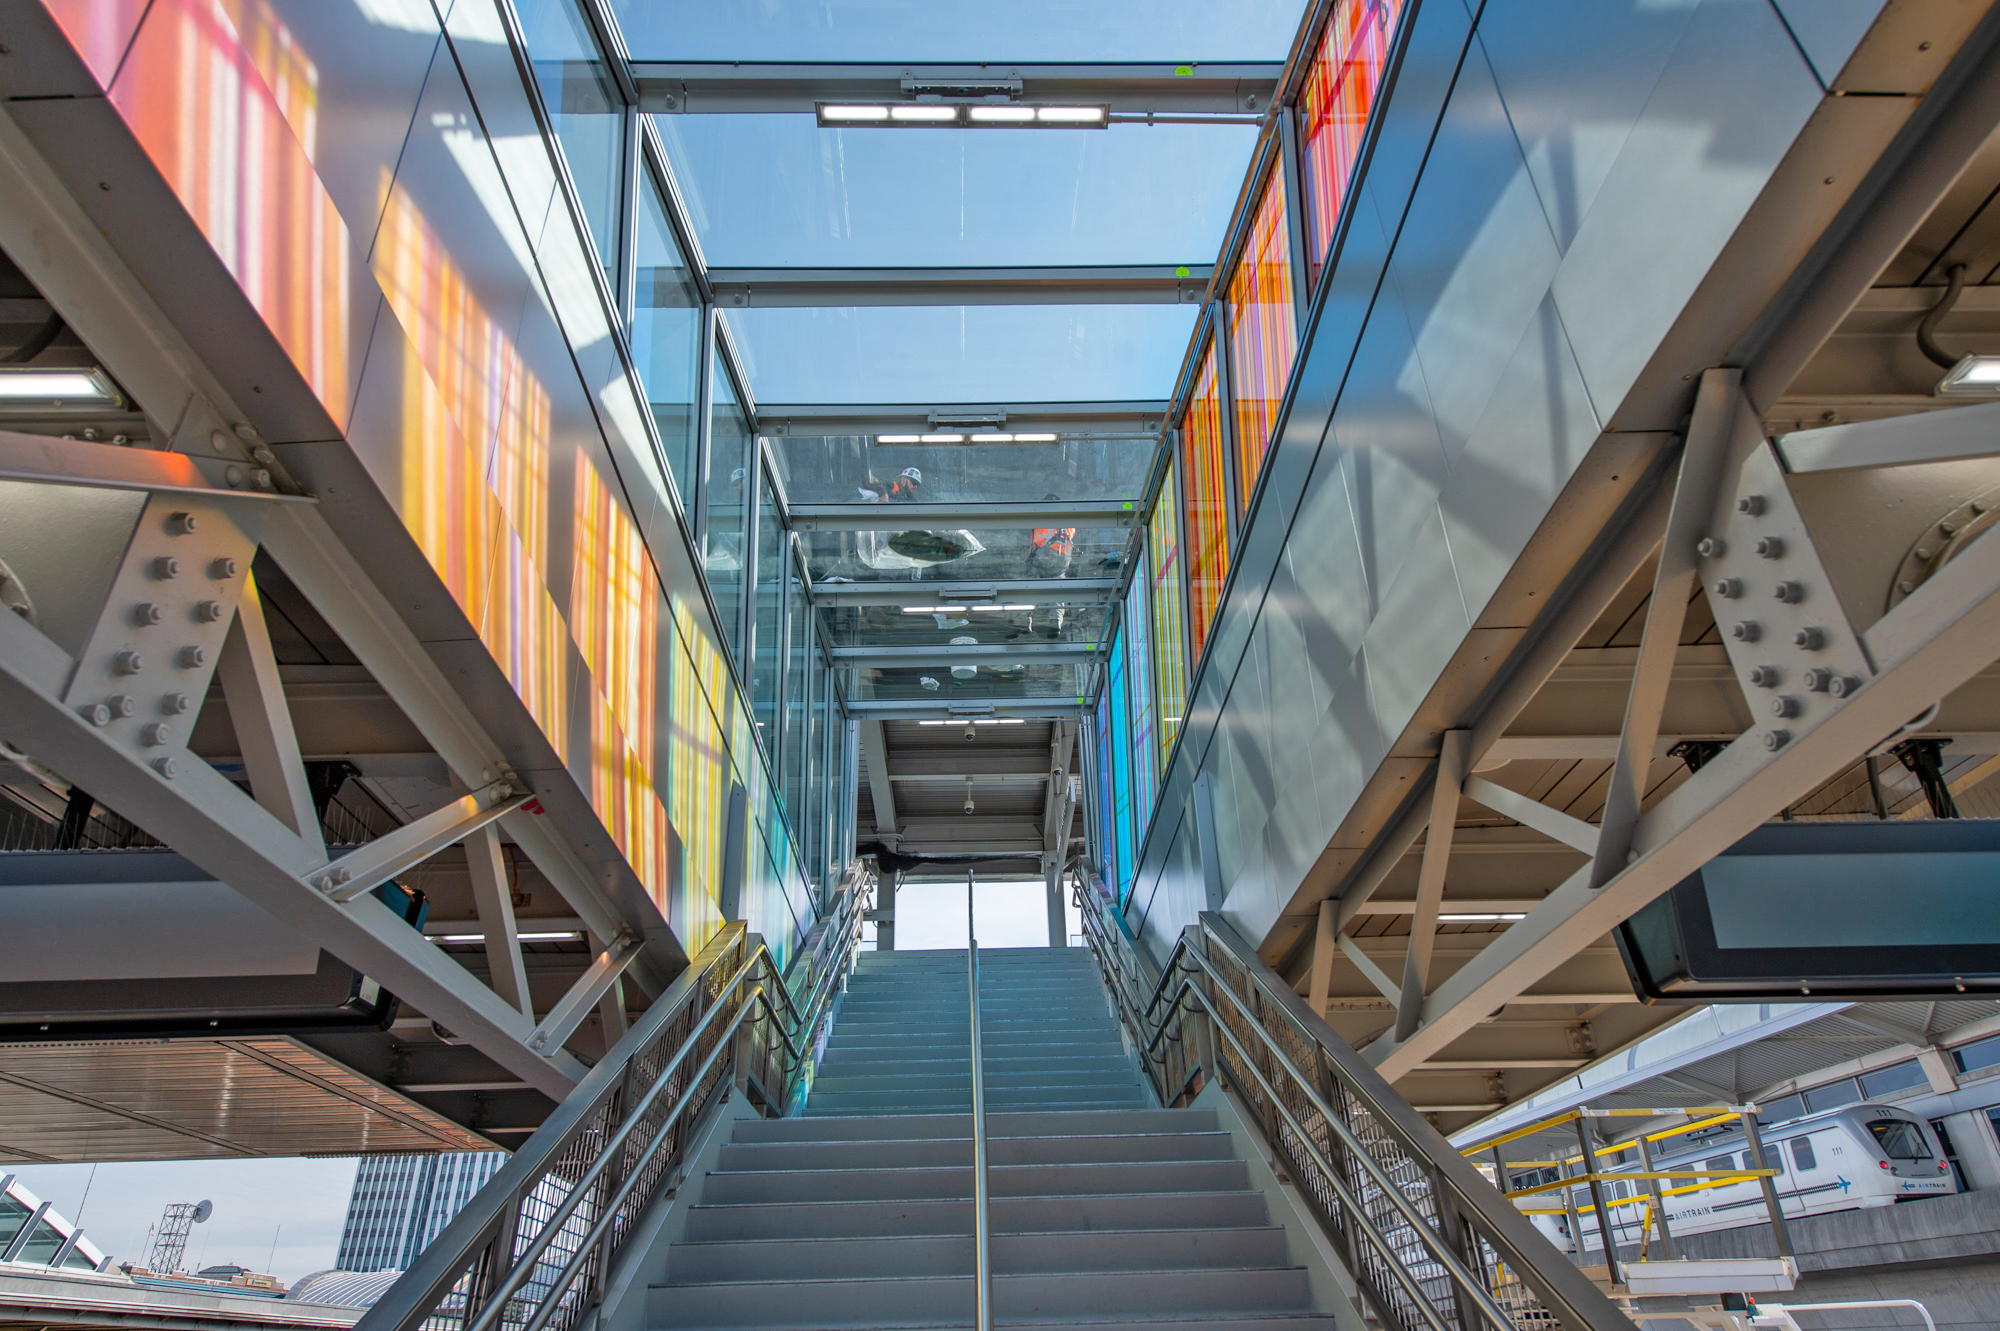 Platform F stairway with glass artwork